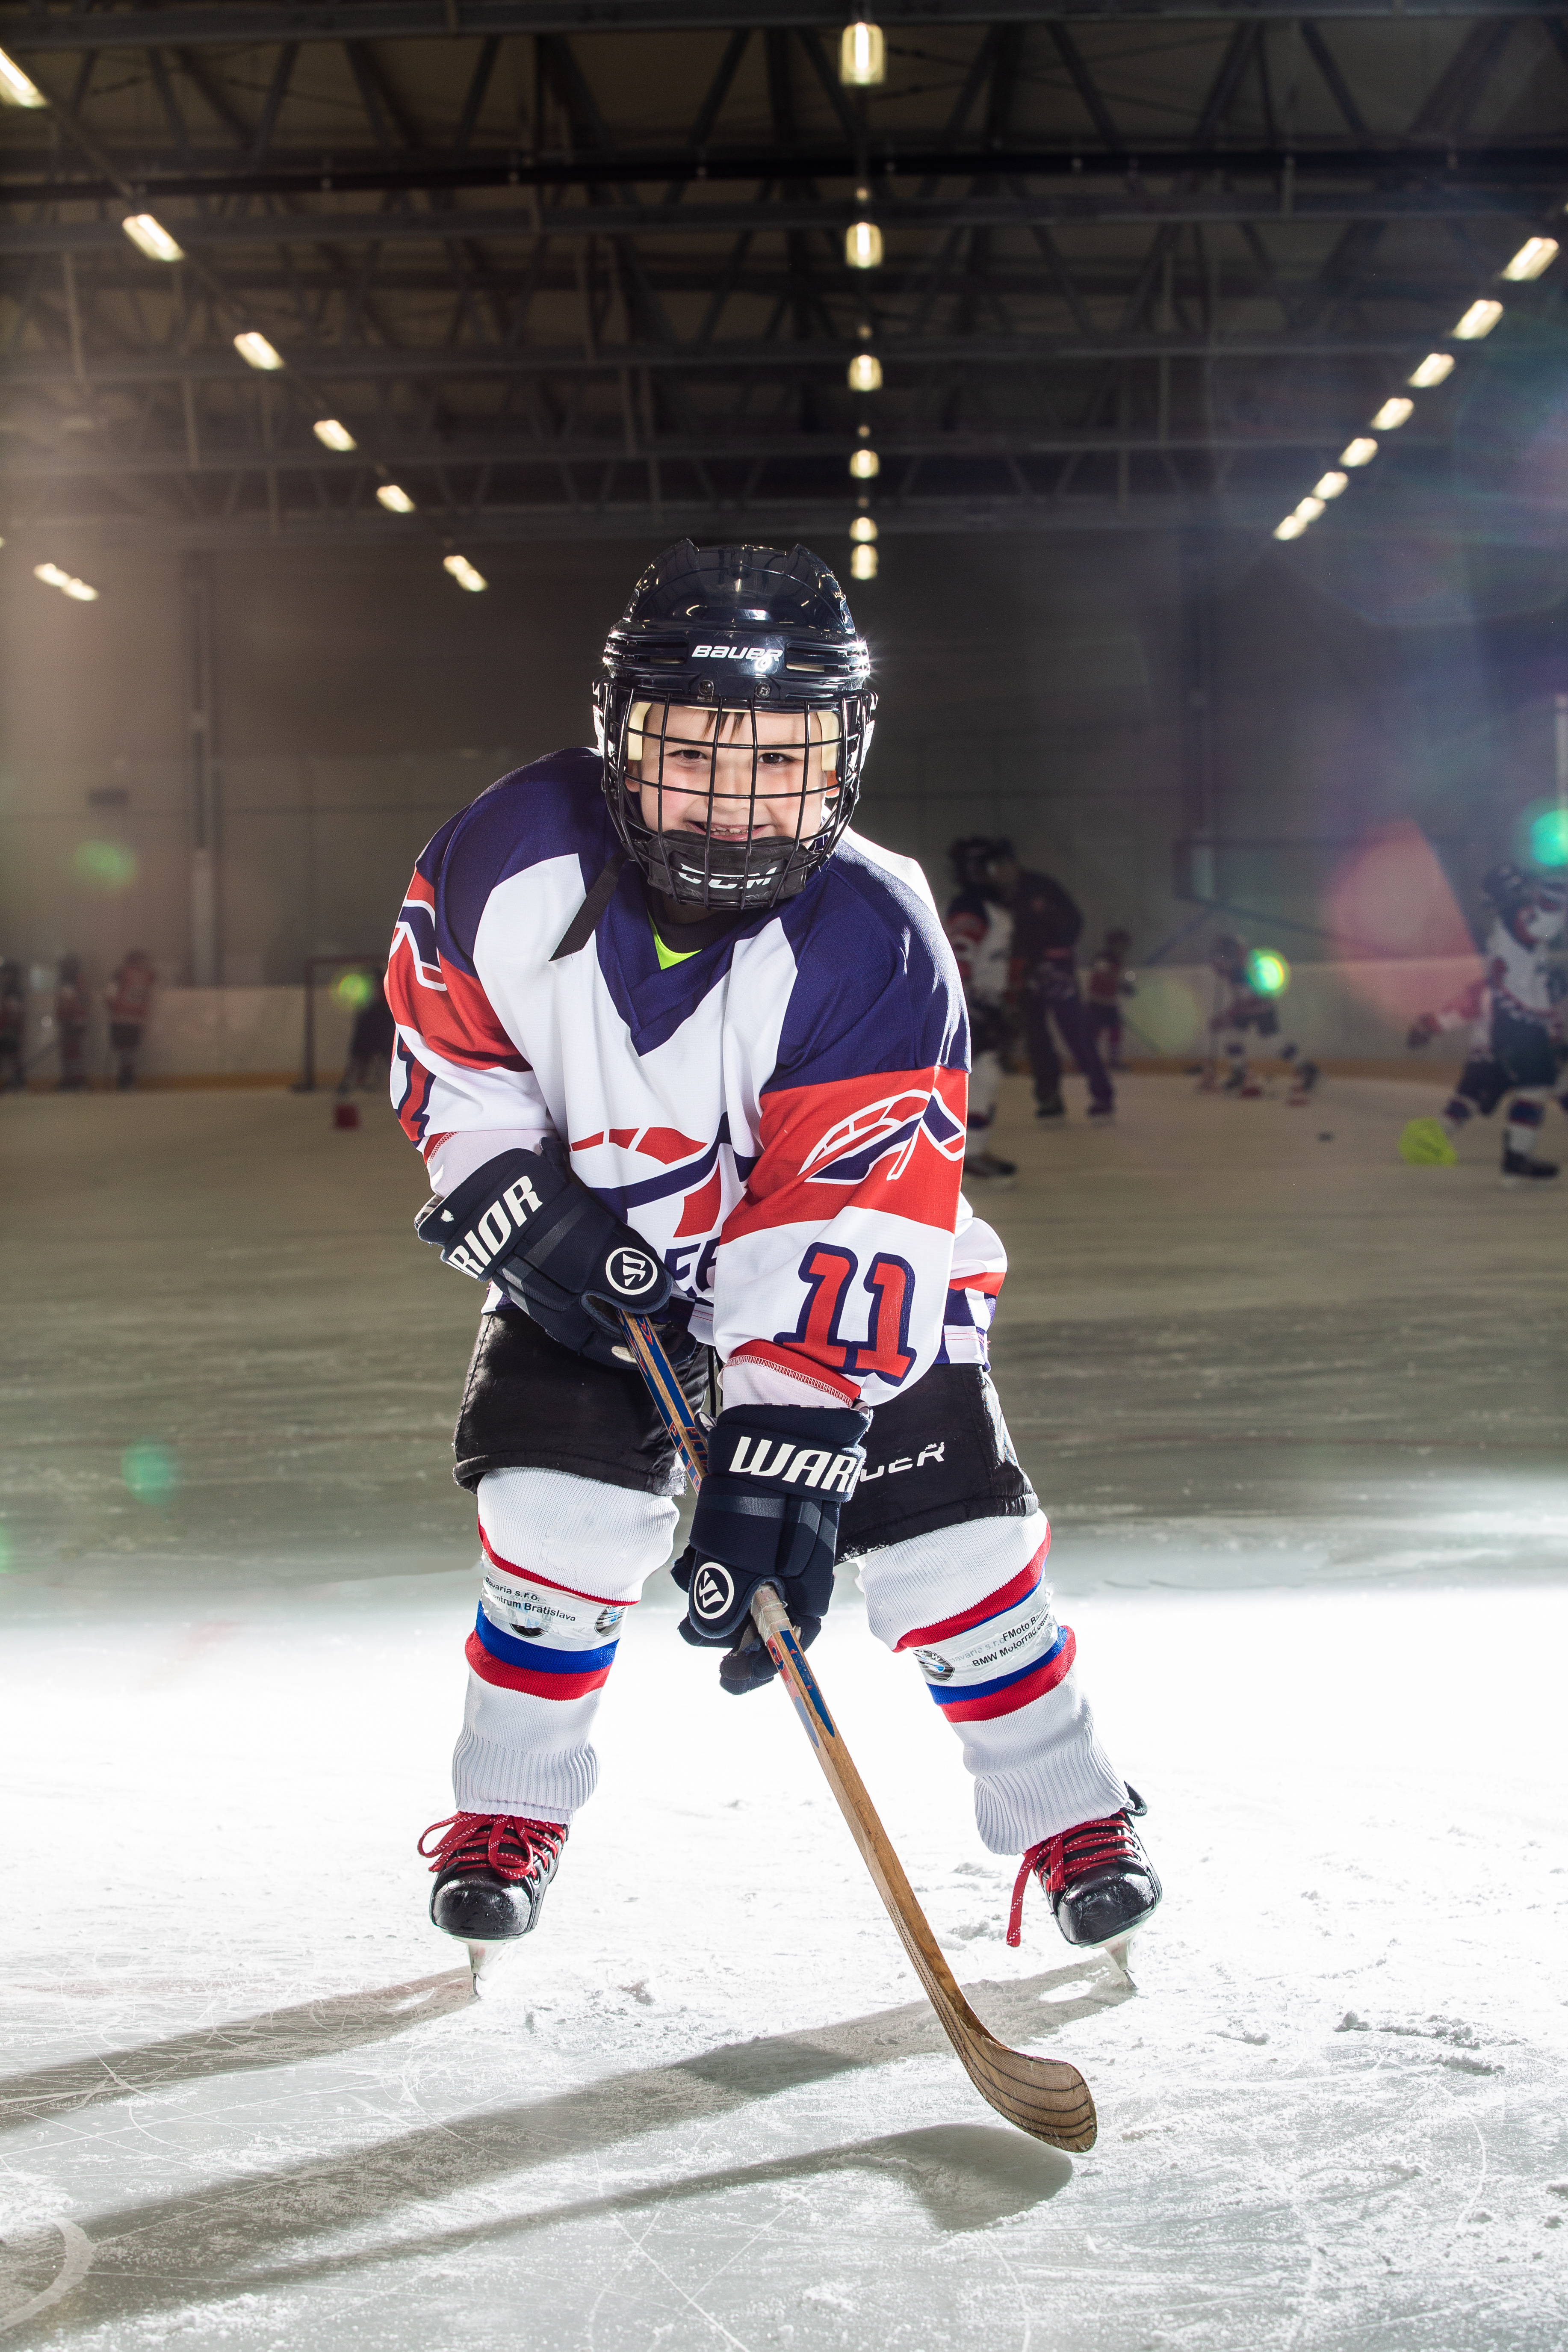 Oliver Kovacic Speeders Bratislava cislo 73 hokej